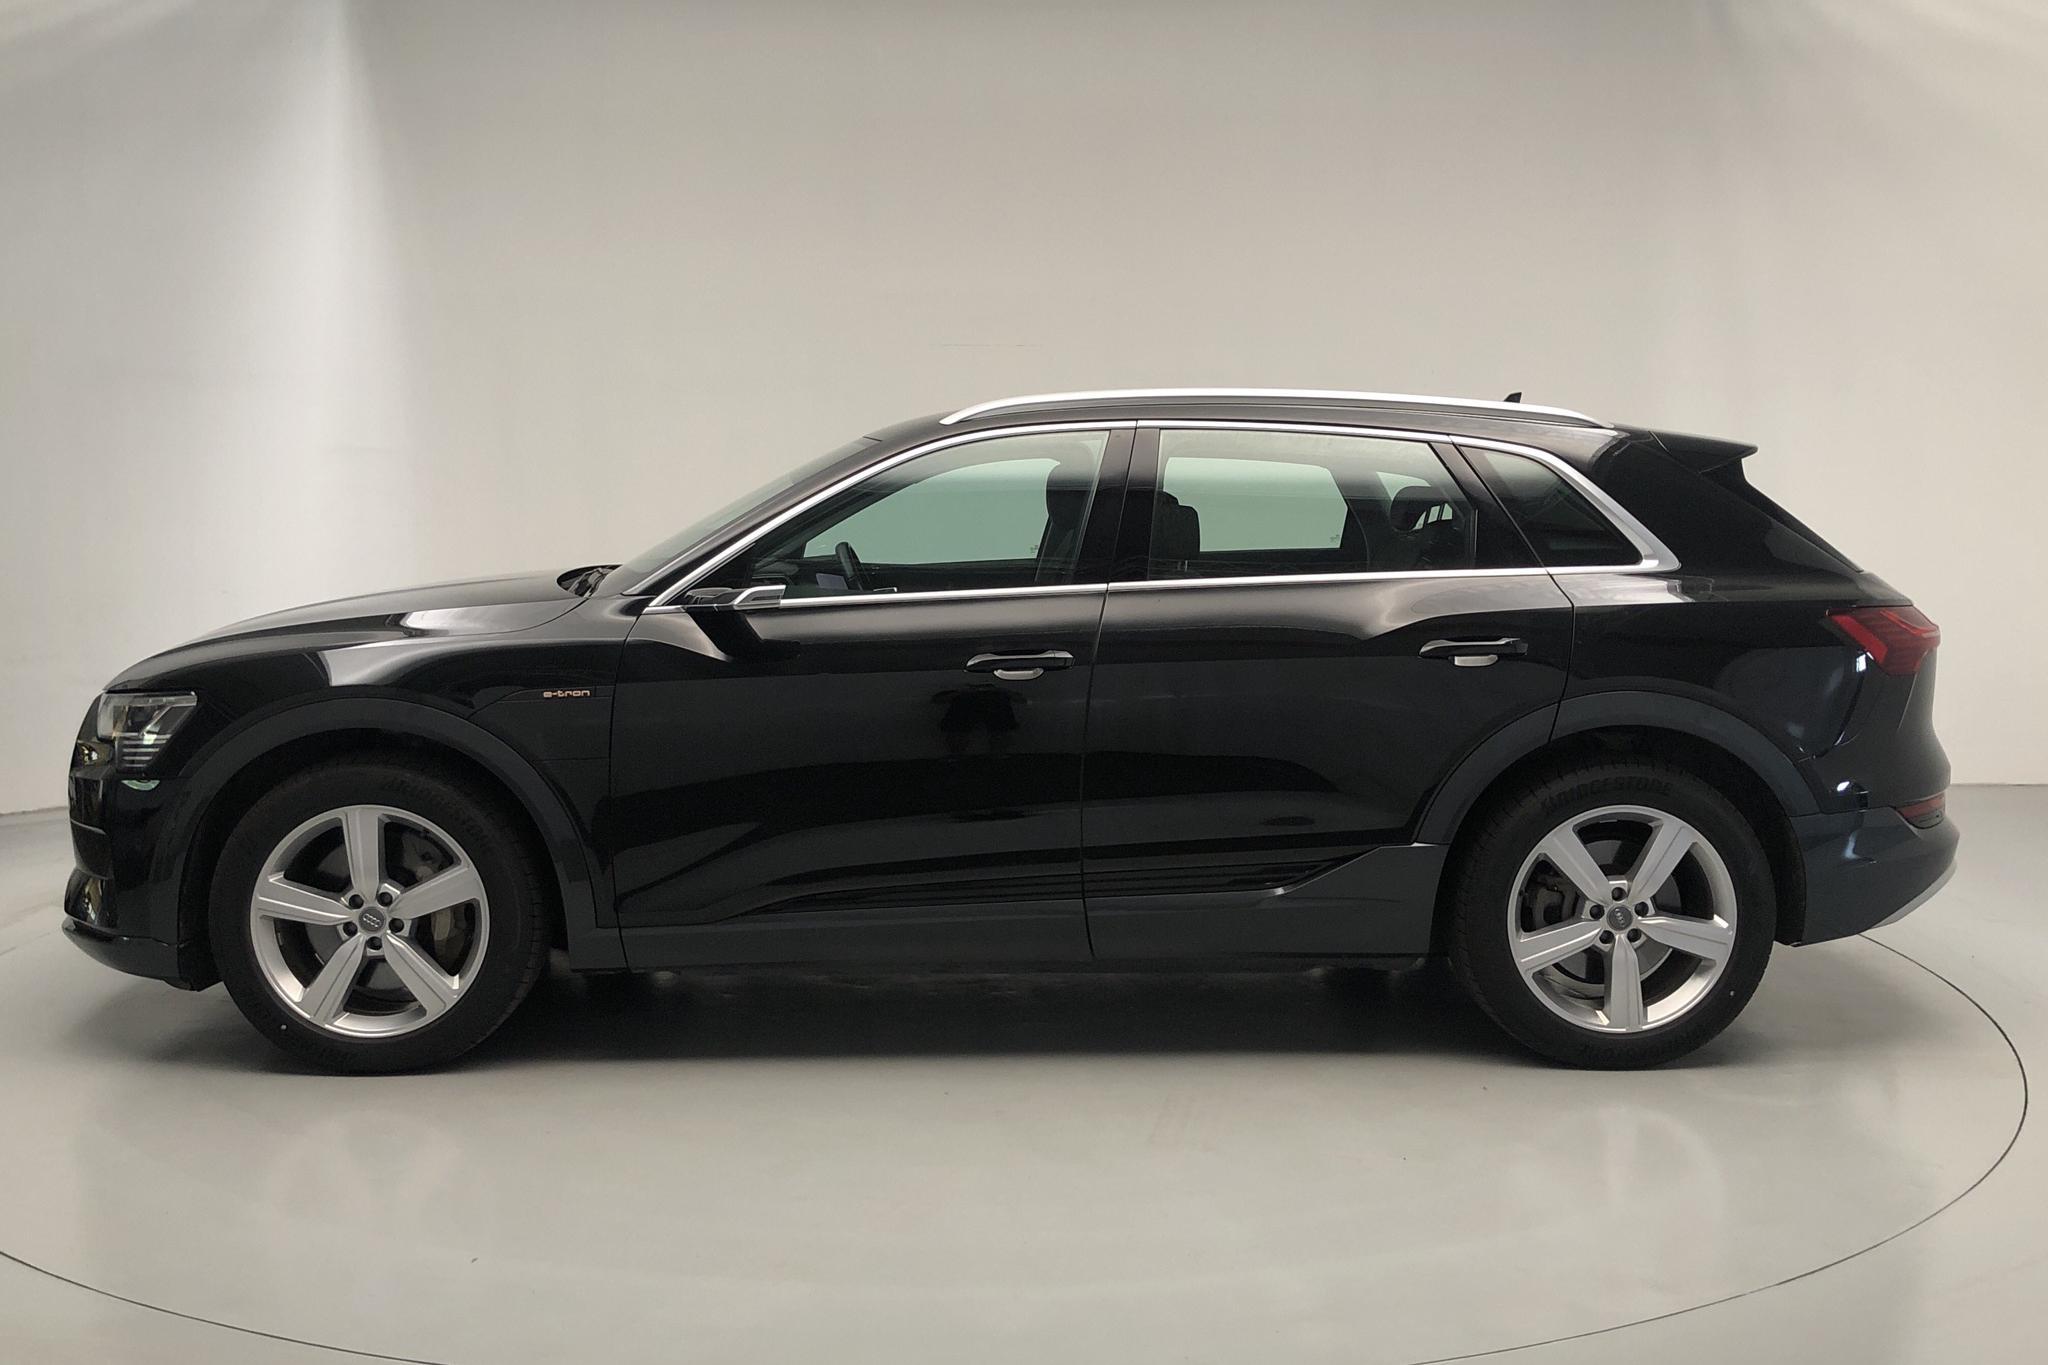 Audi e-tron 55 quattro 95 kWh (360hk) - 50 620 km - Automatic - black - 2019